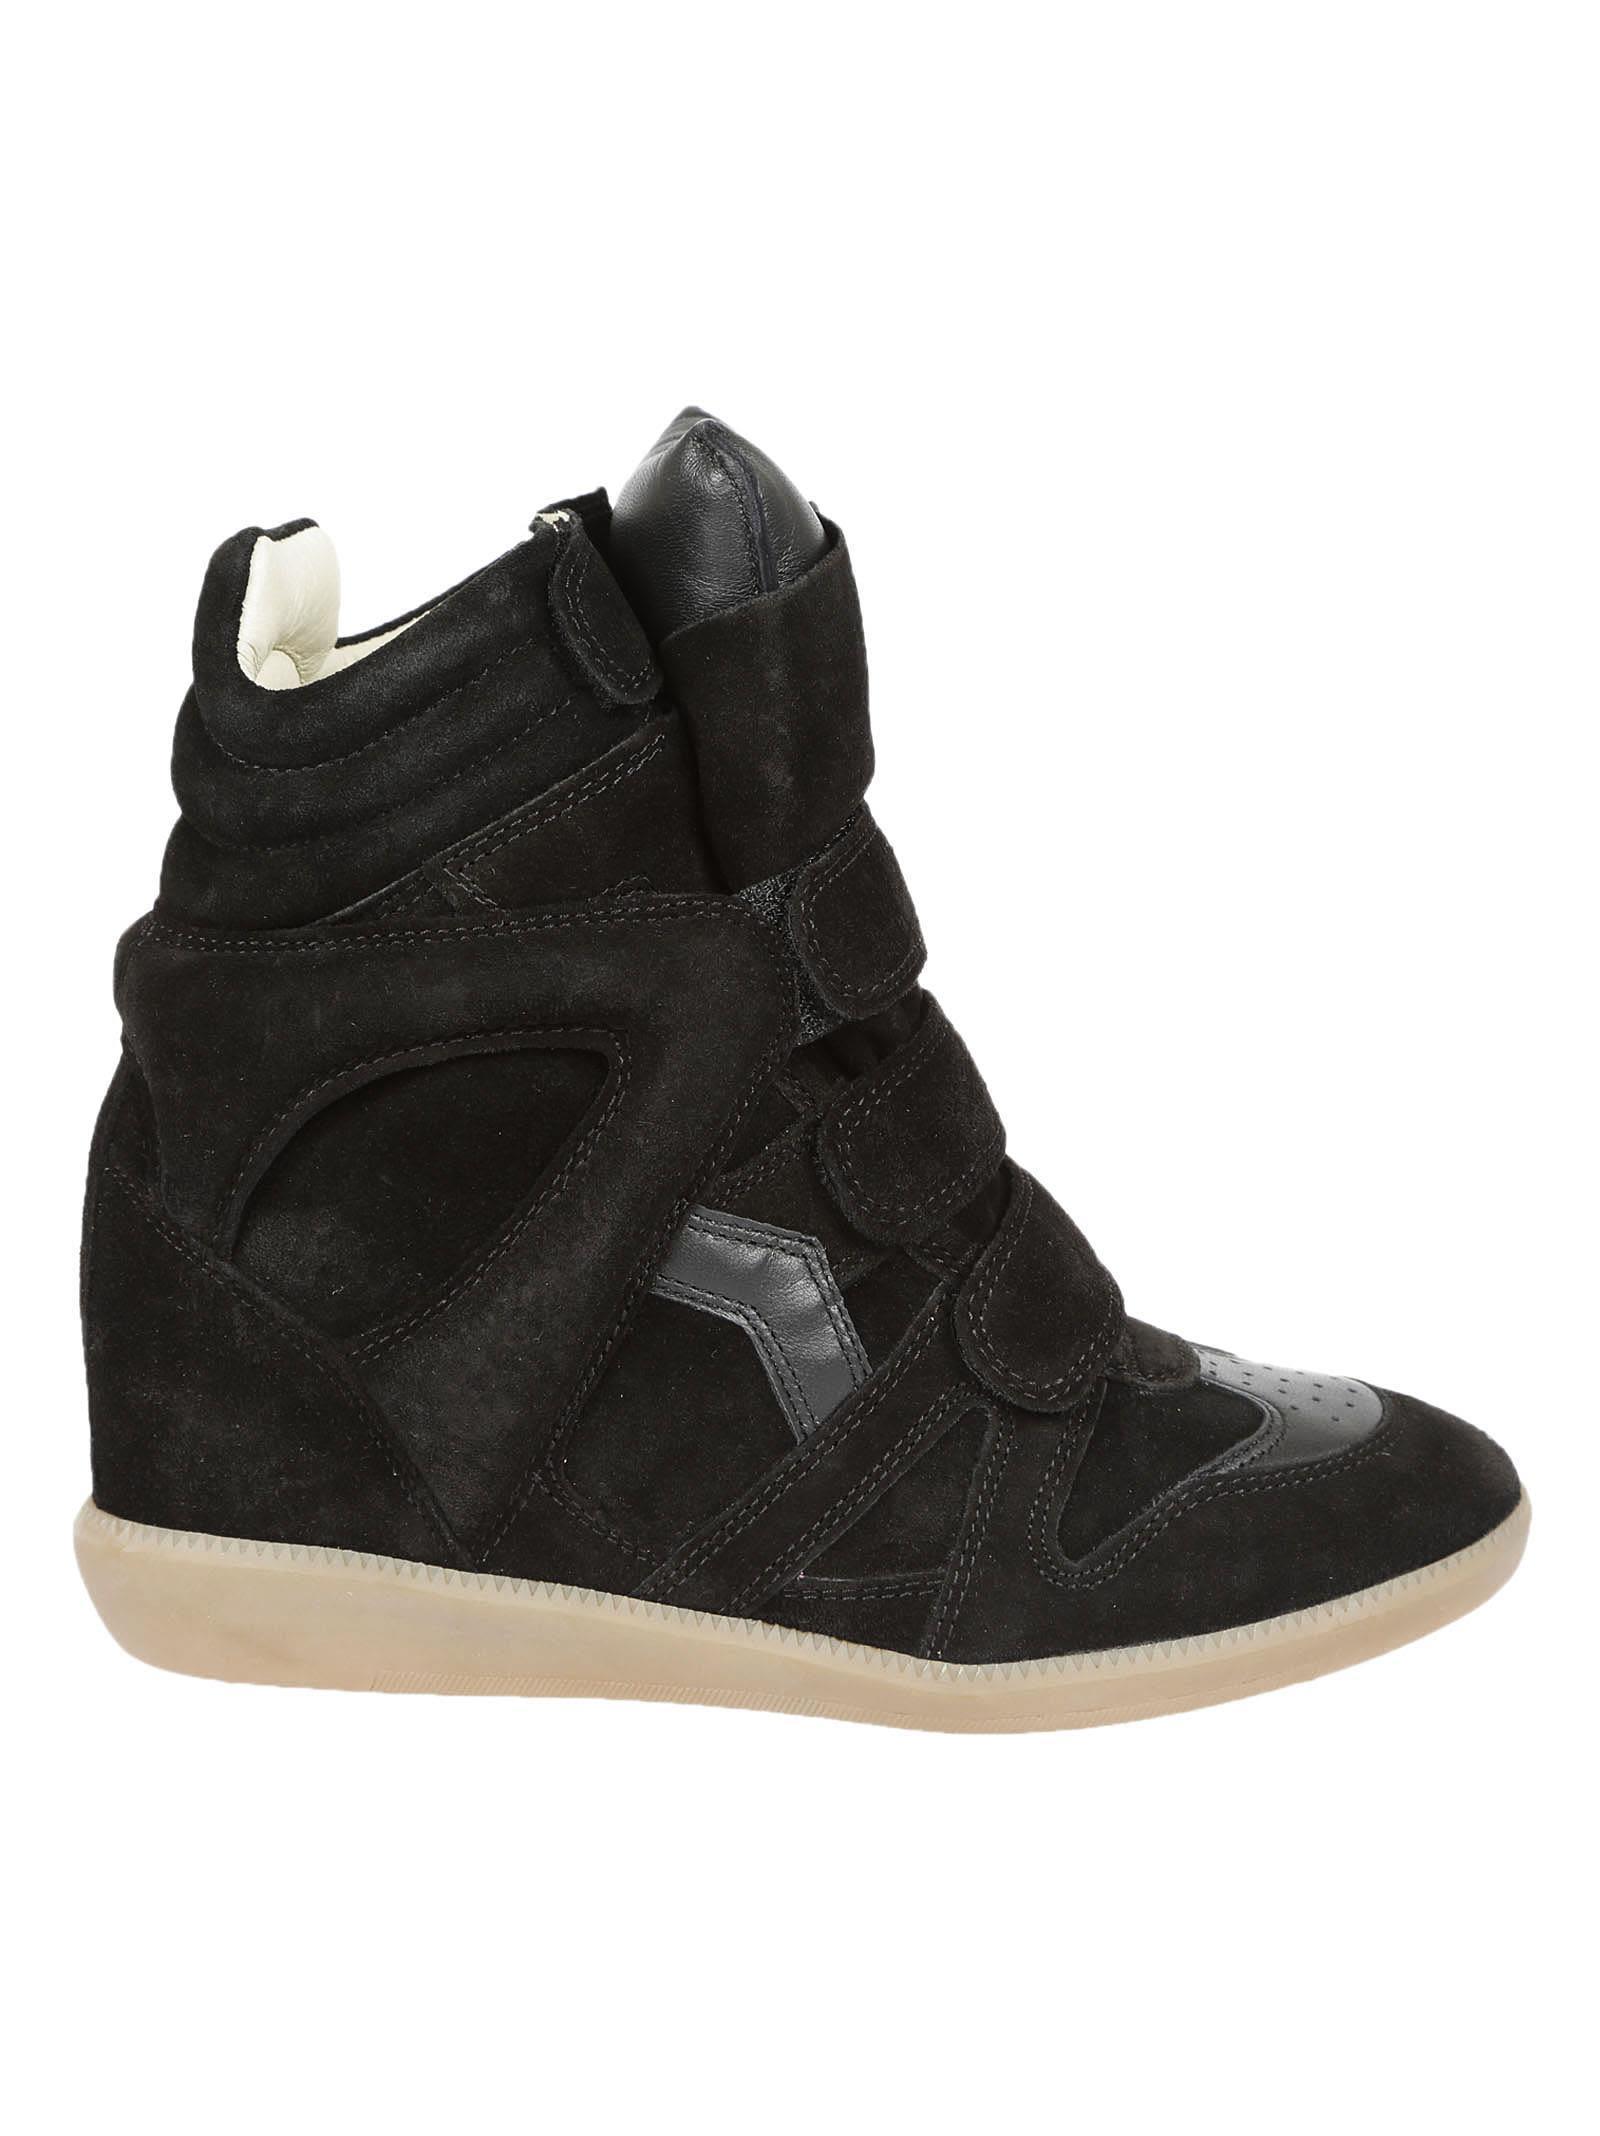 f006c3b8f8dd Isabel Marant Bekett Leather-Trimmed Suede Wedge Sneakers In Black ...